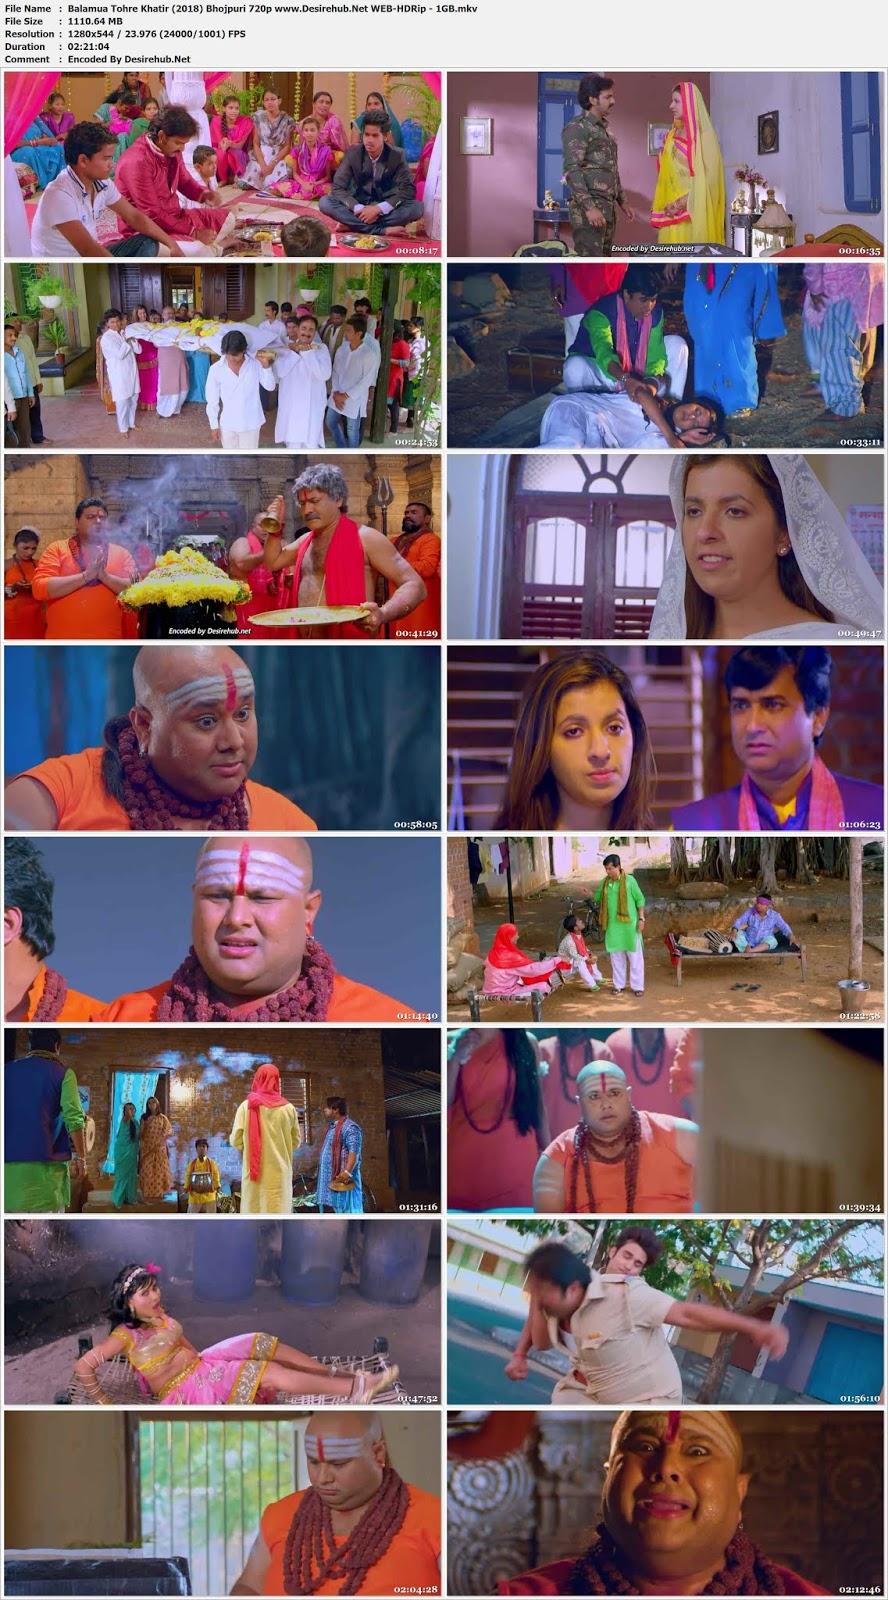 Balamua Tohre Khatir (2018) Bhojpuri 720p WEB-HDRip – 1GB Desirehub